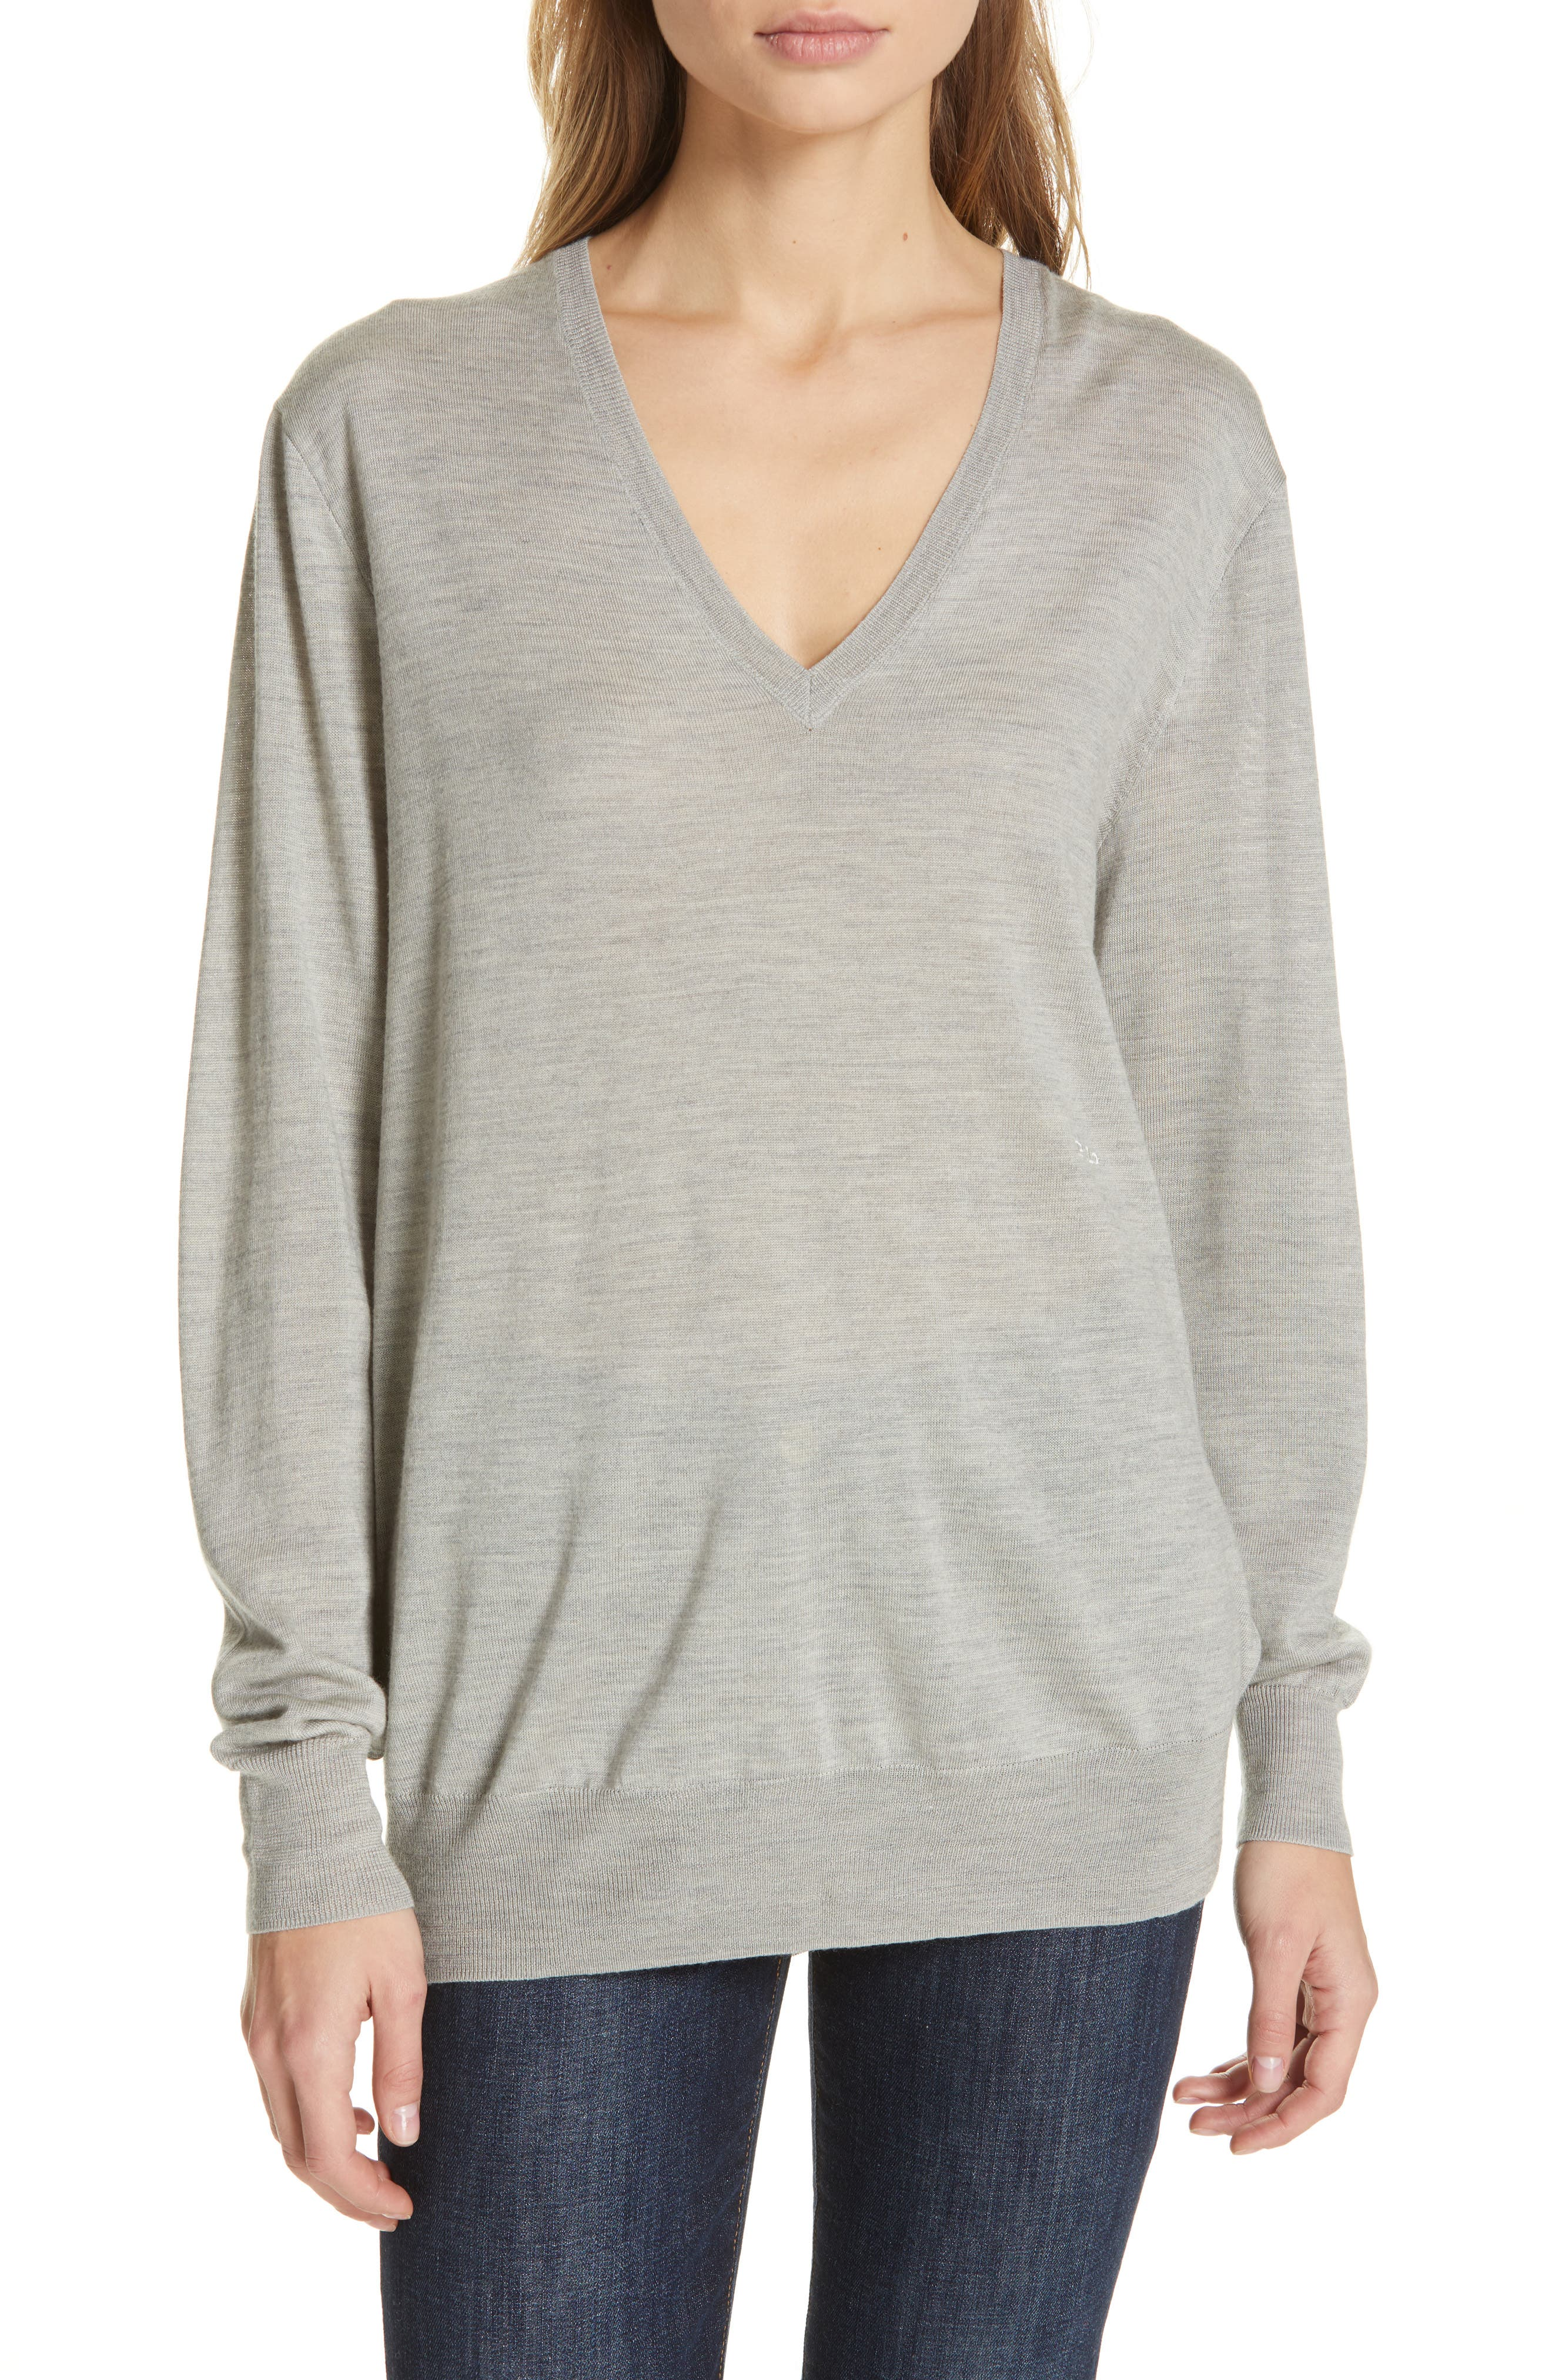 Polo Ralph Lauren V-Neck Wool, Silk & Cashmere Sweater, Grey